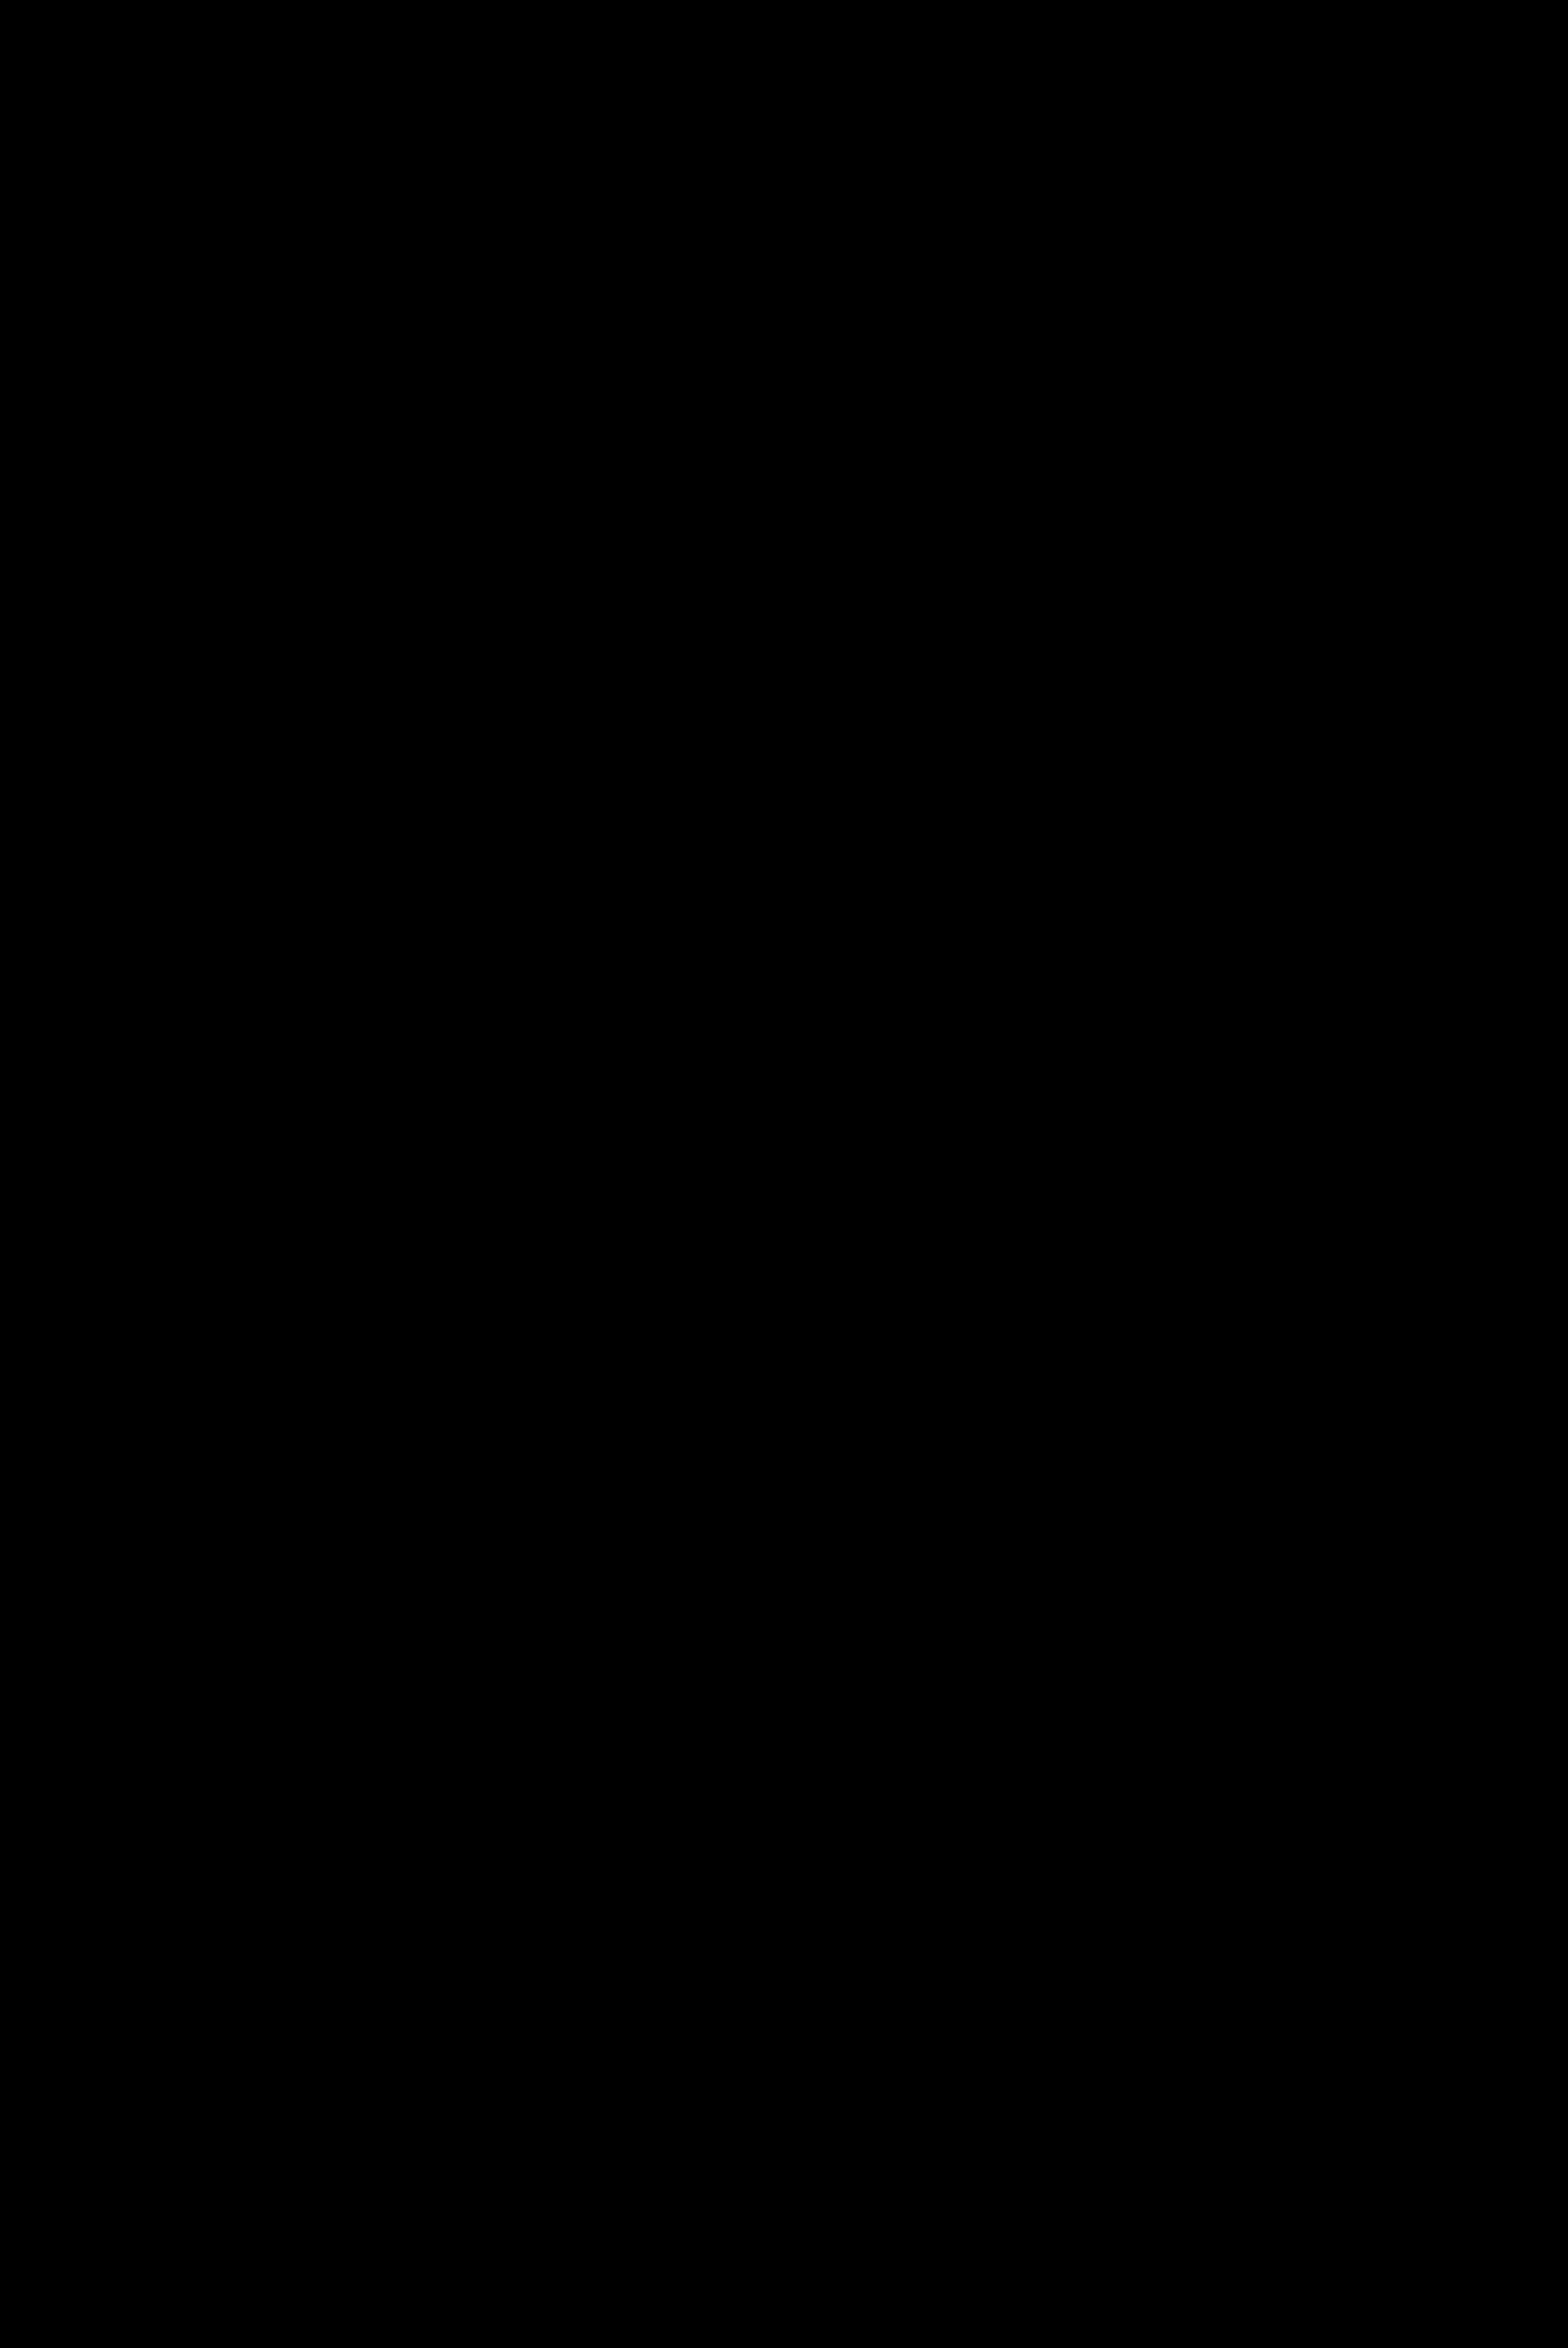 Electronic circuit symbols microsoft word